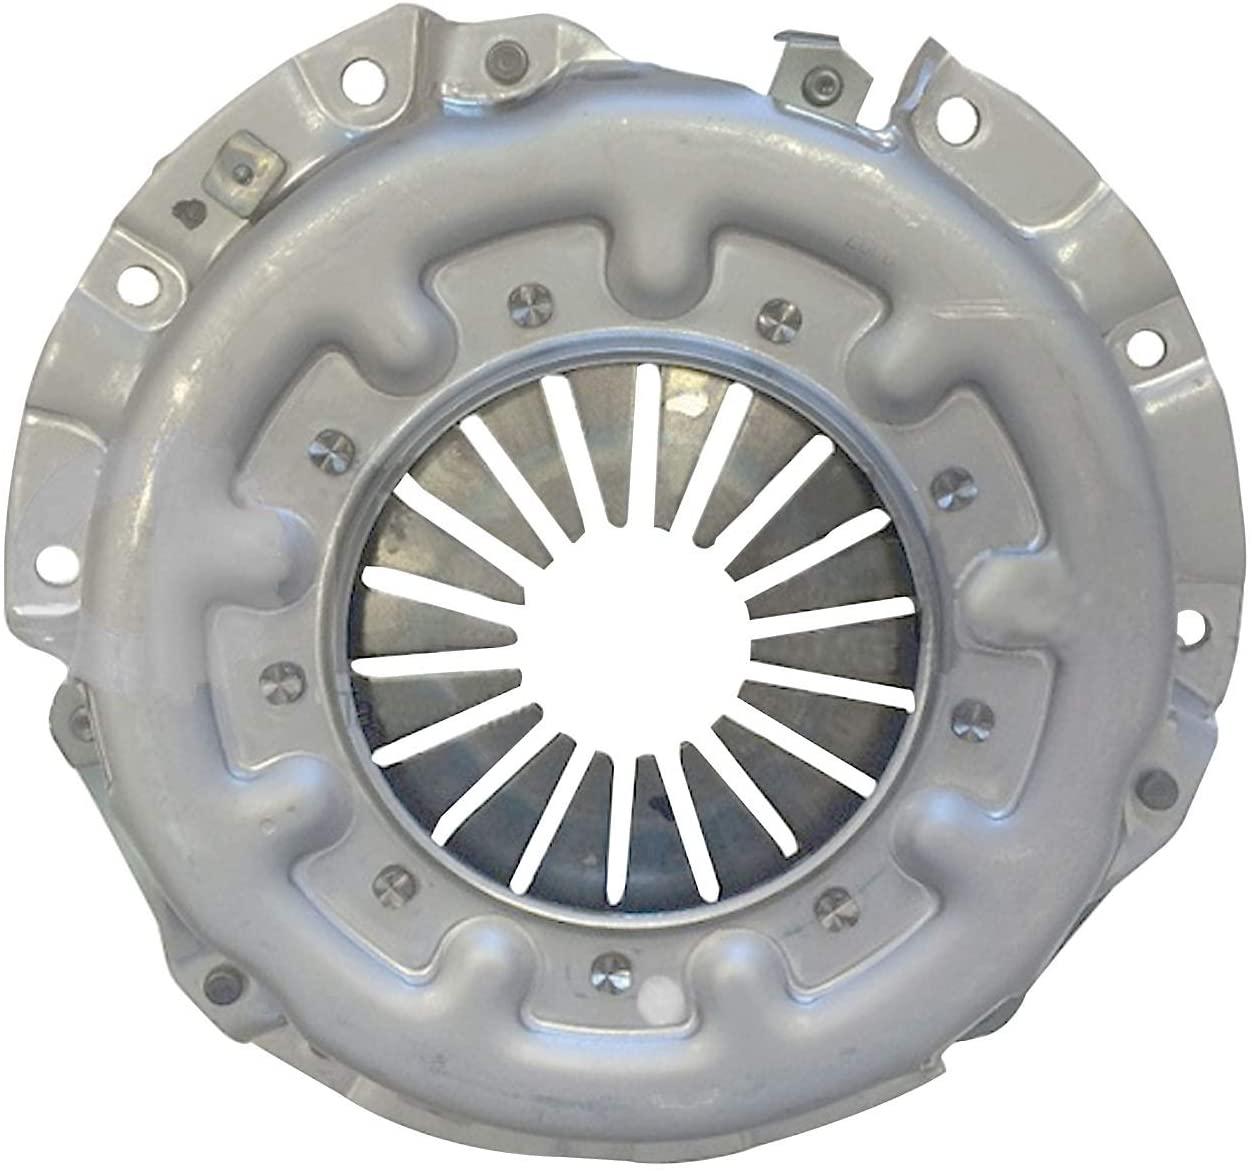 Noton parts VPP1557 6C04013300 New Pressure Plate: 8 A-6C040-13300 Fits for Kubota Compact Tractors B1700 B2100 B2400 B2410 B2710 B2910 B7500 B7510 Front Mower F2000 F2100